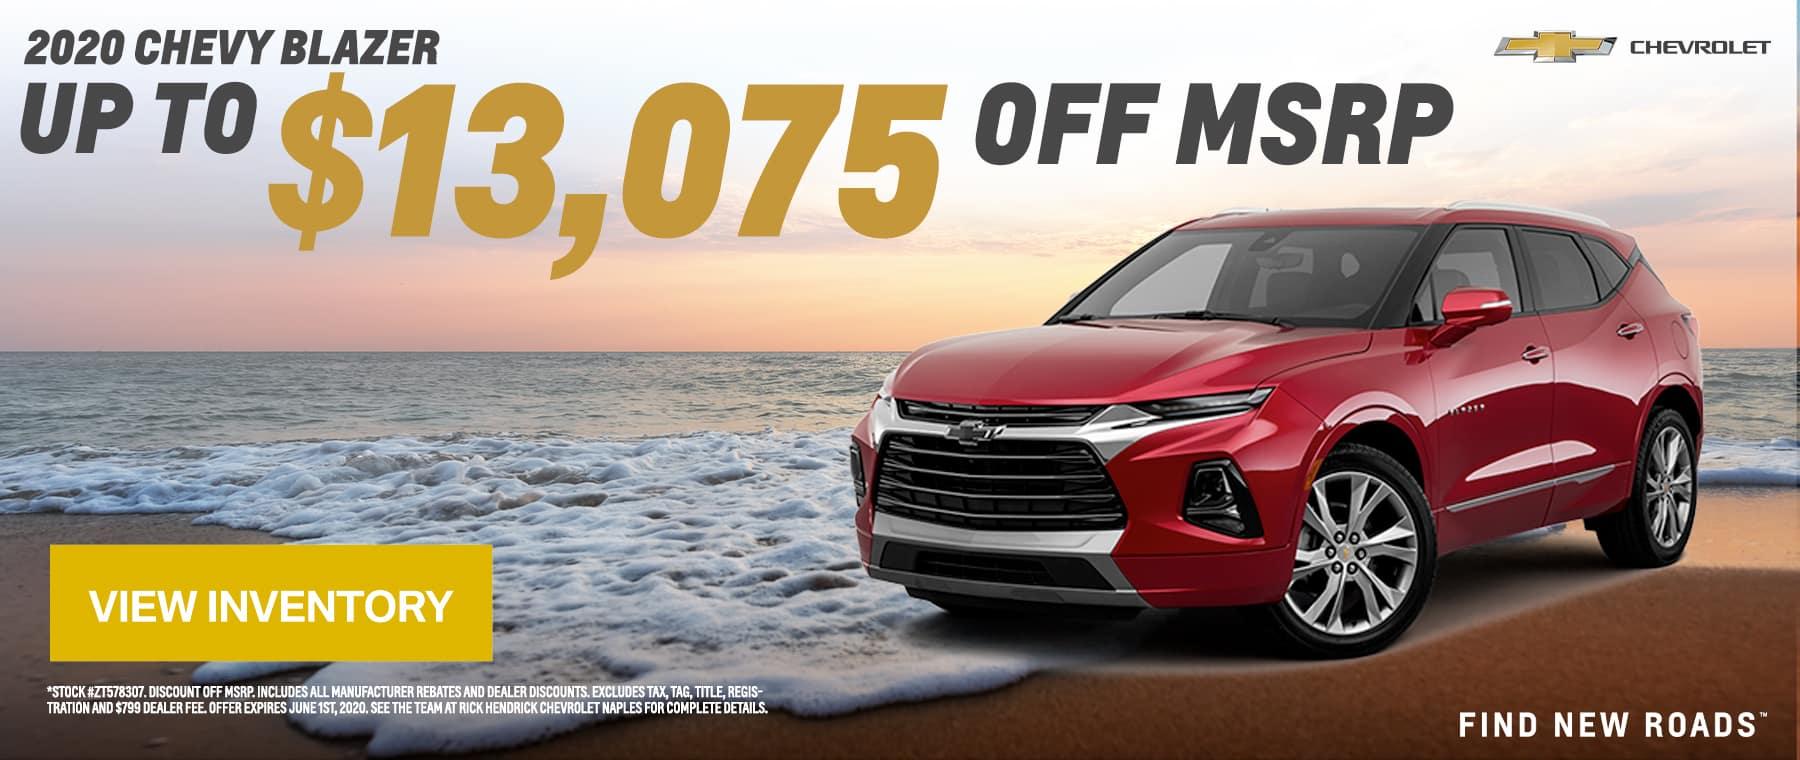 2020 blazer offer may 2020 $13,075 off MSRP